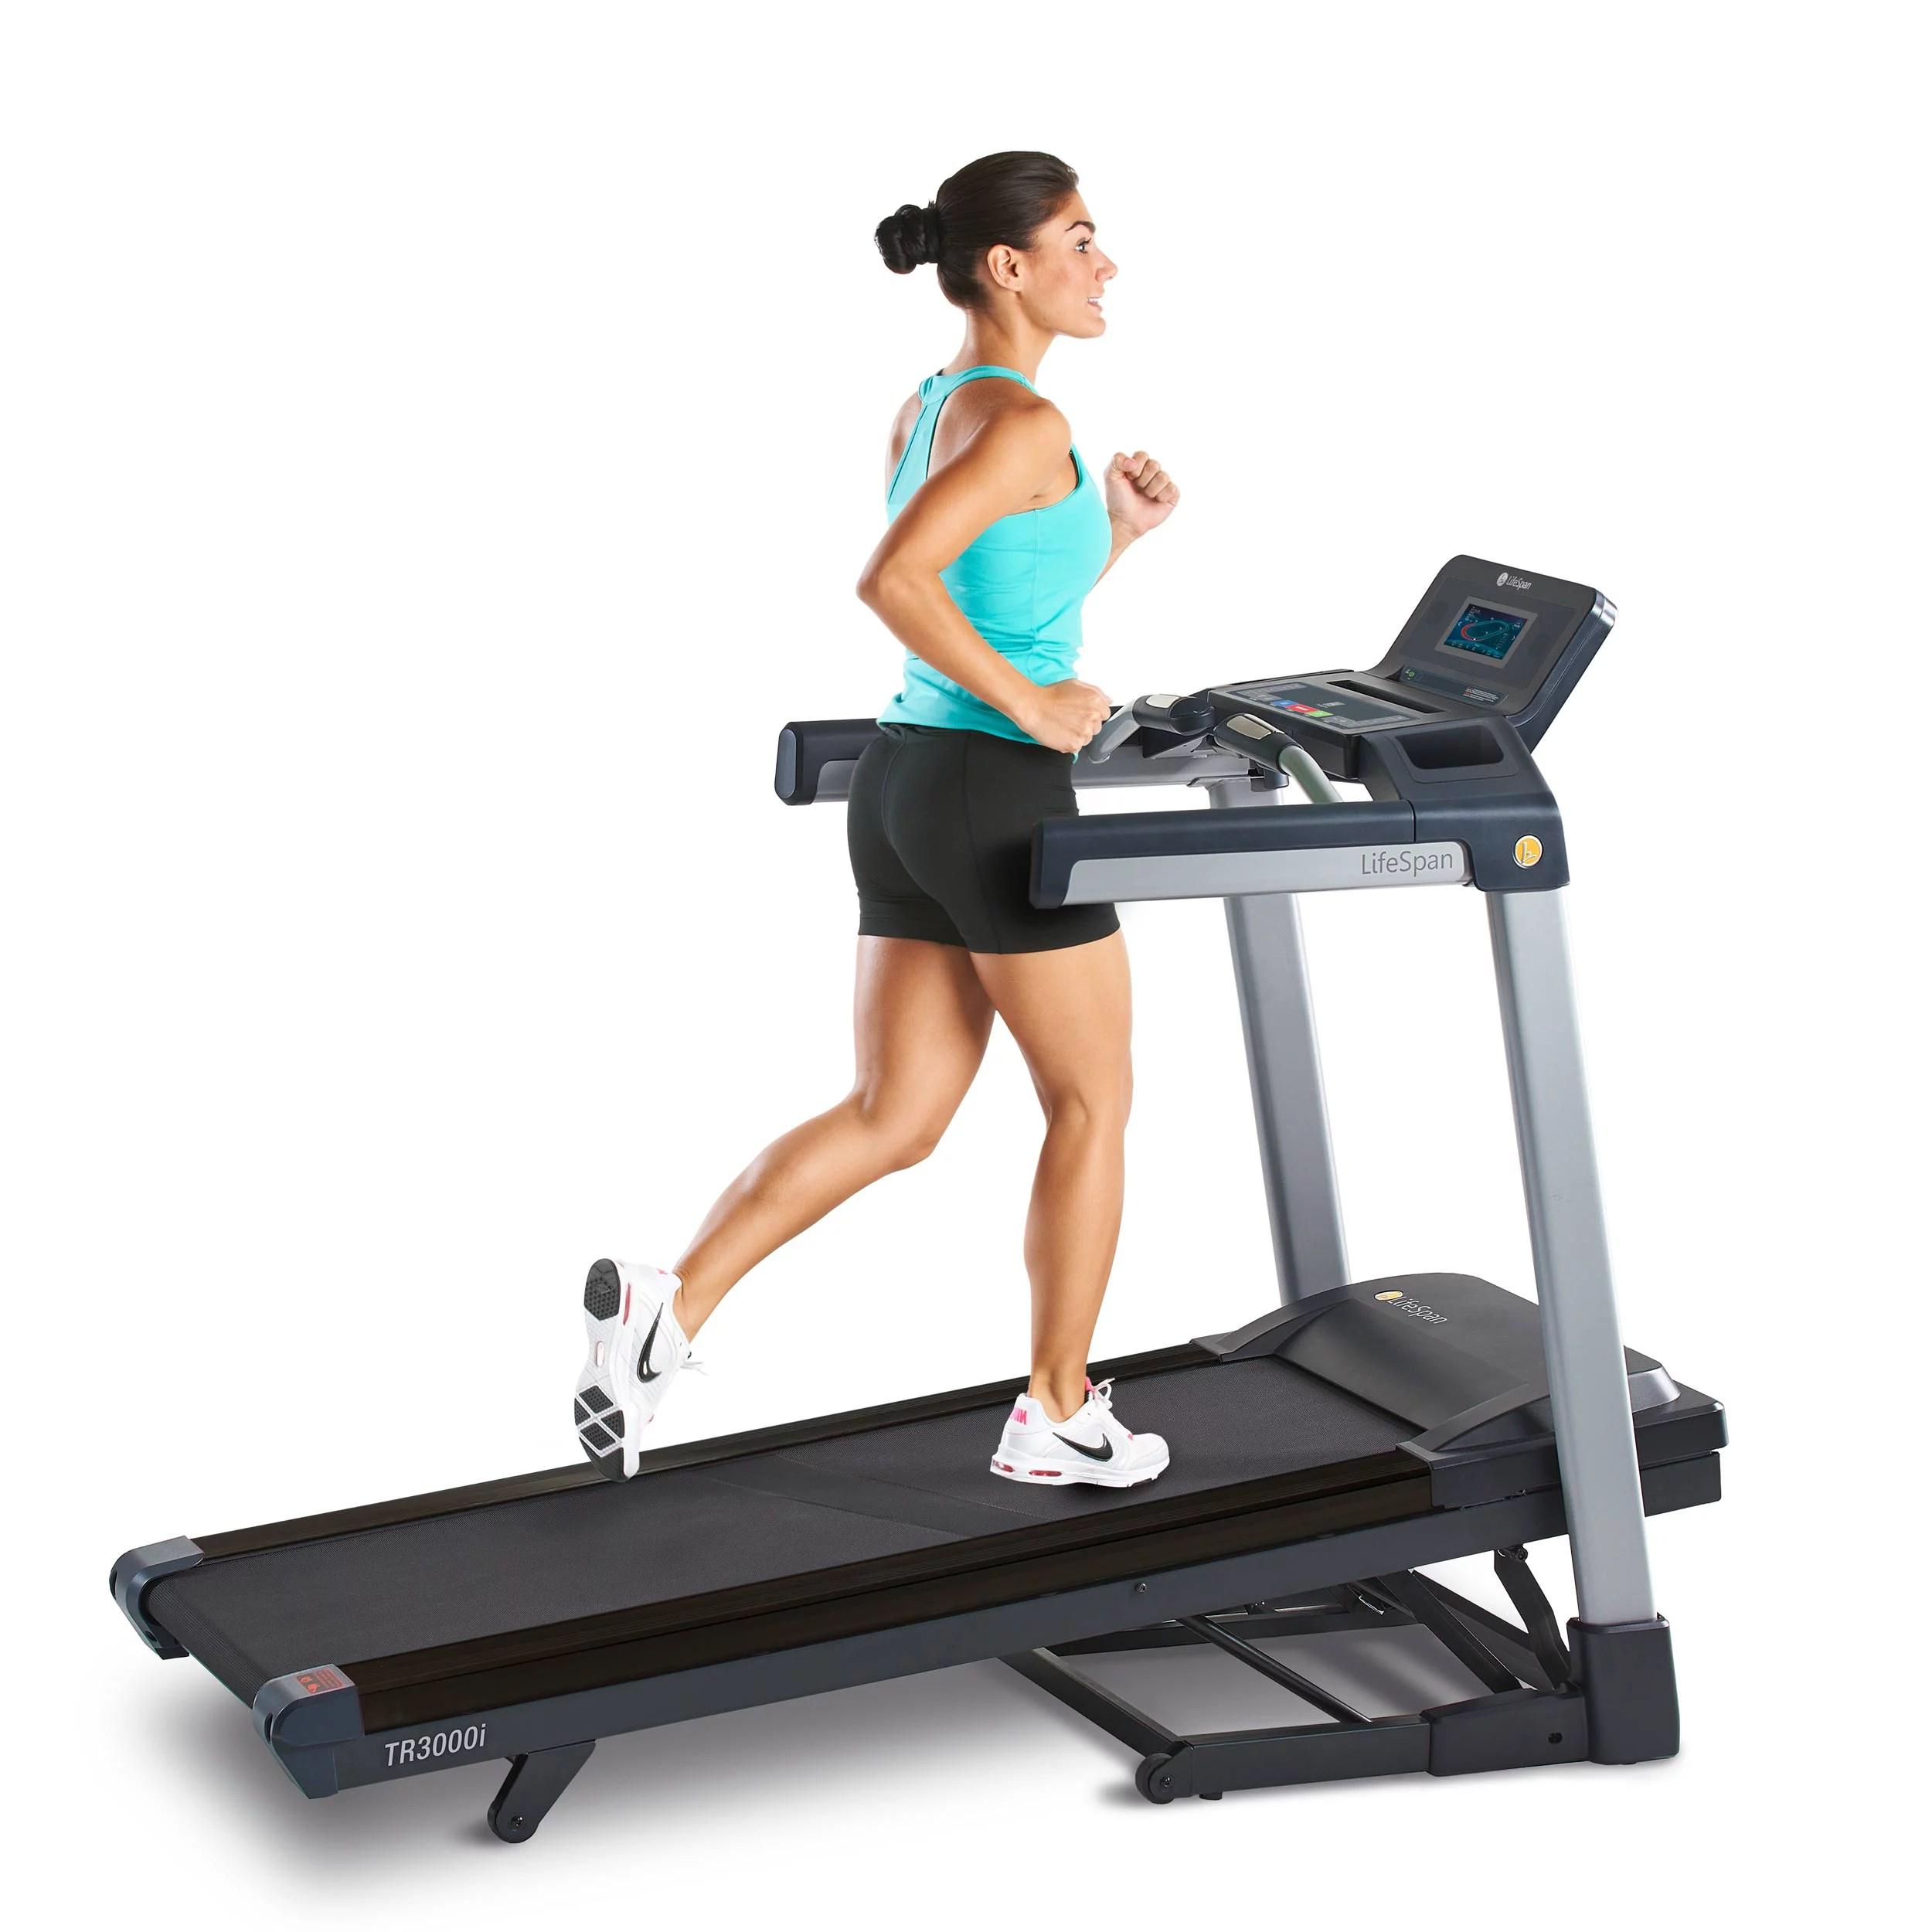 Lifespan Fitness Tr I Touch Folding Treadmill